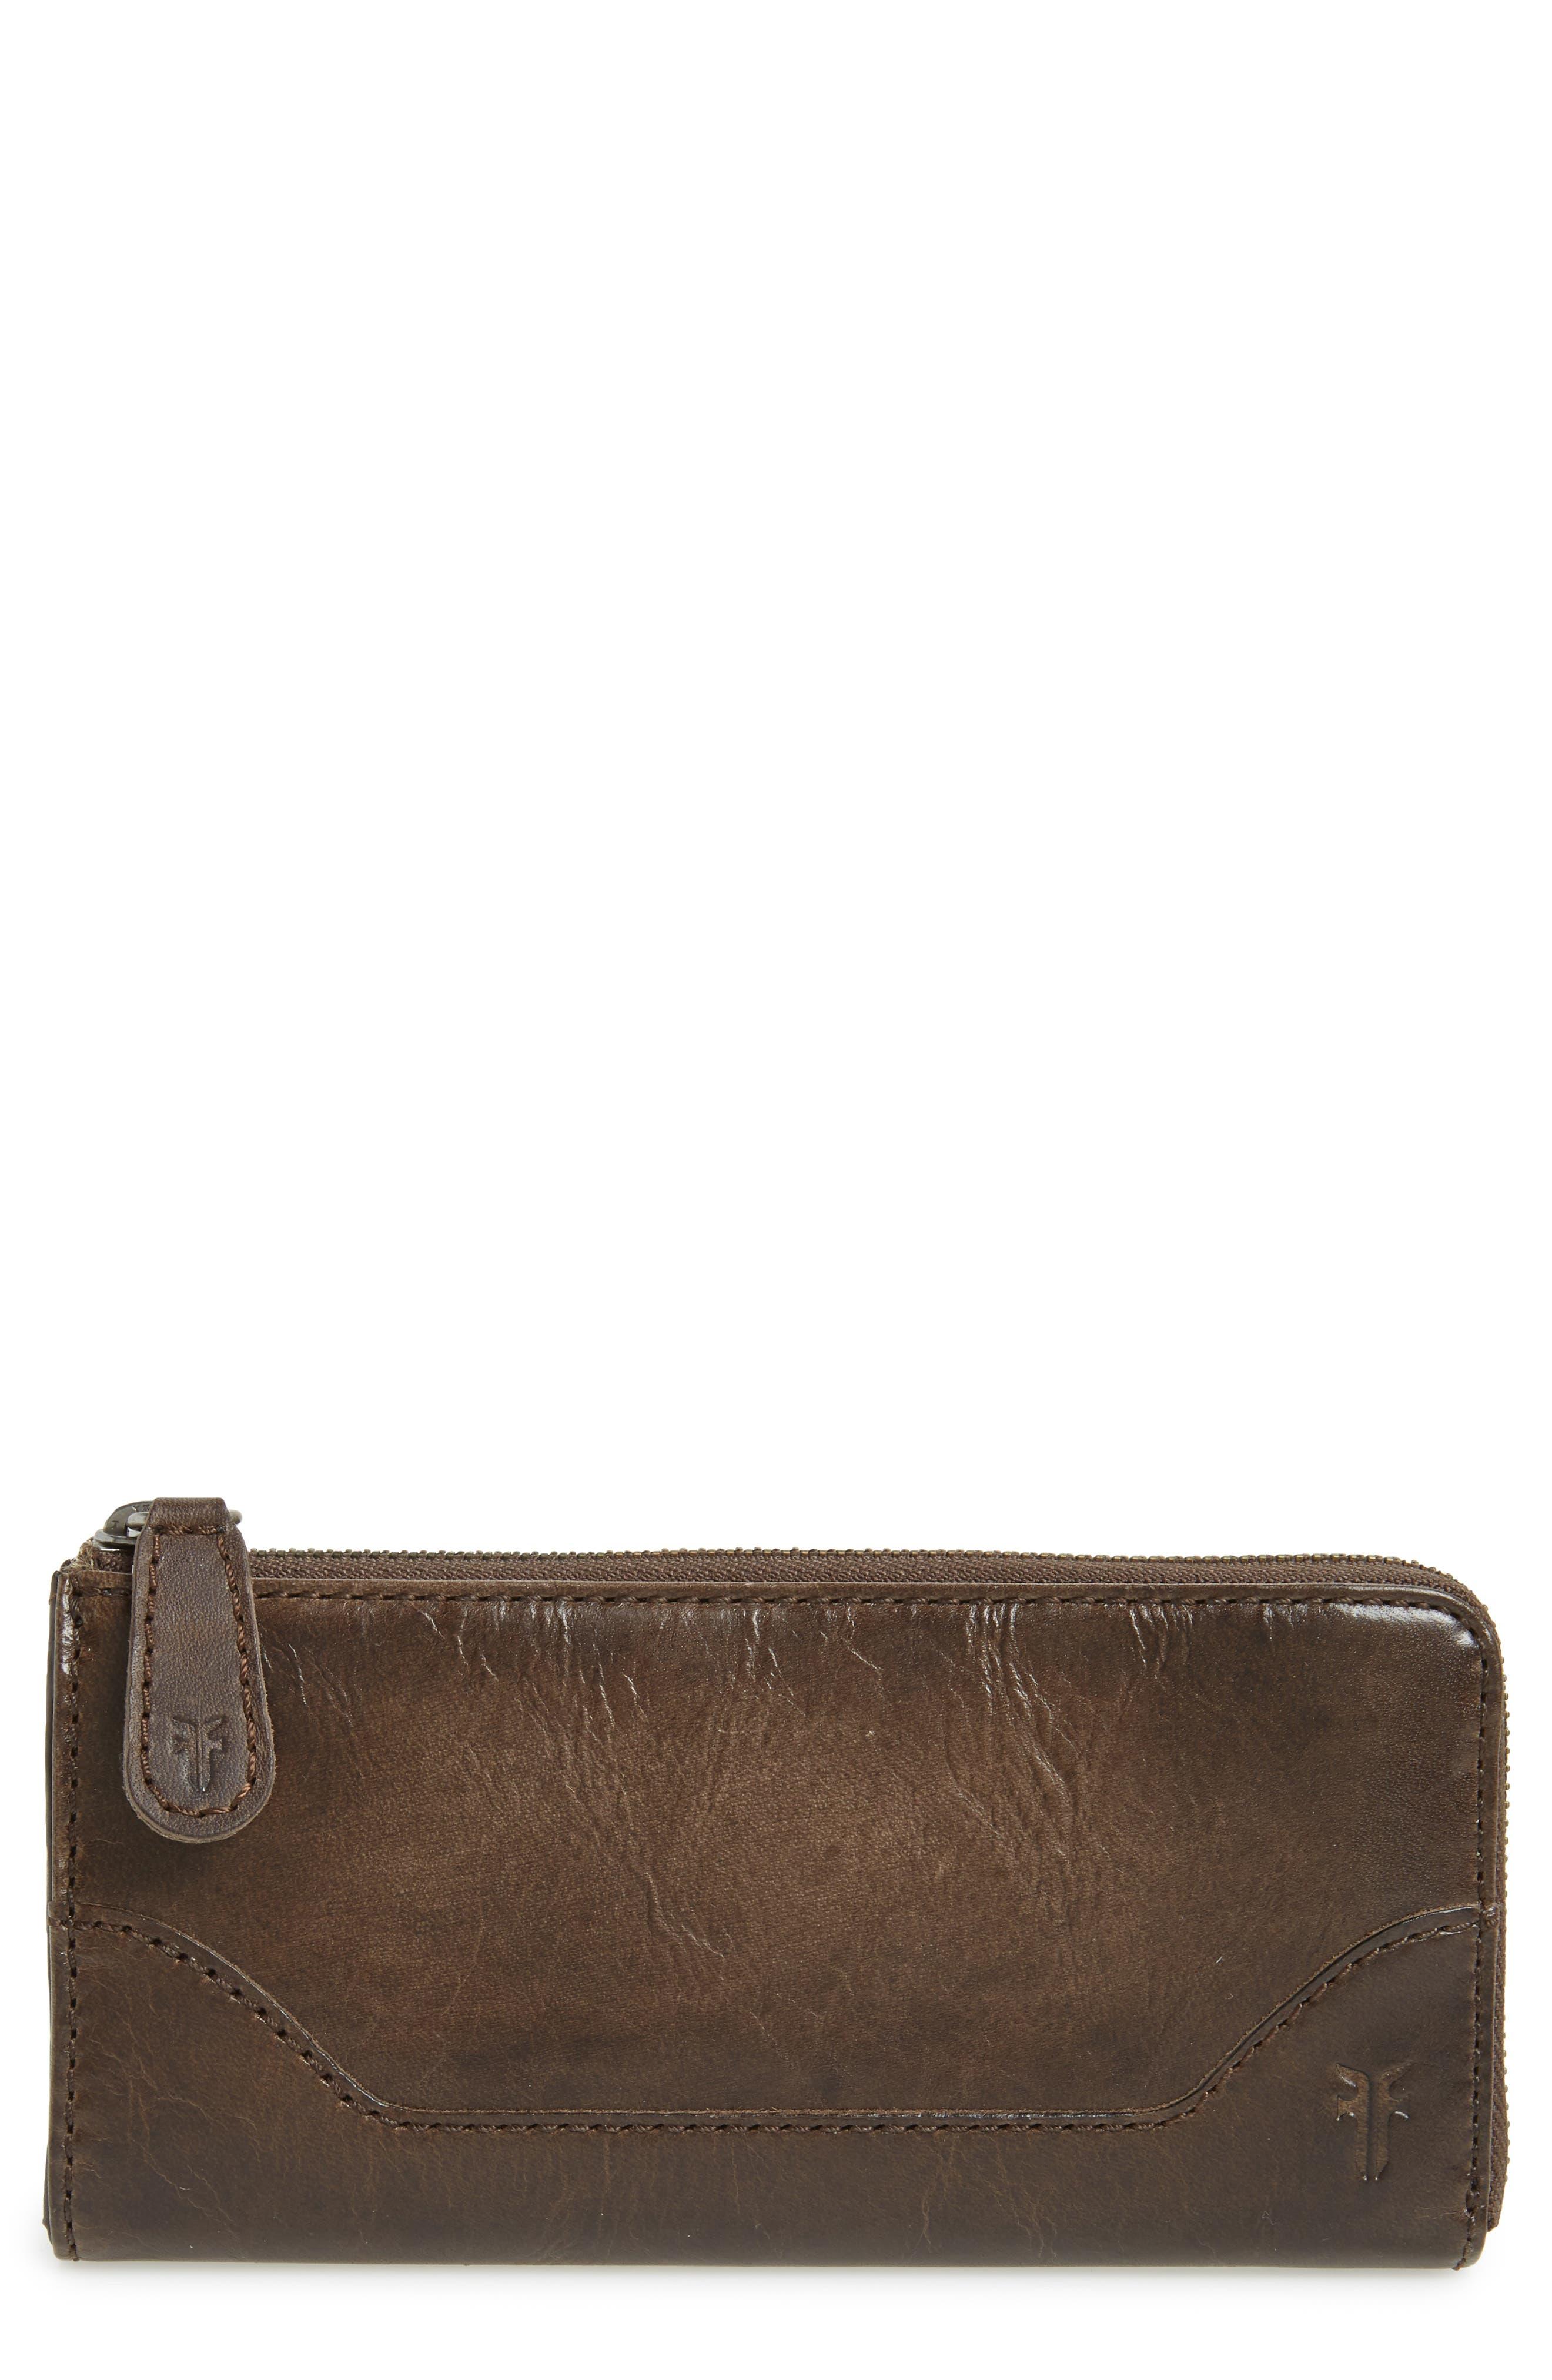 Melissa Leather Wallet,                         Main,                         color, Slate